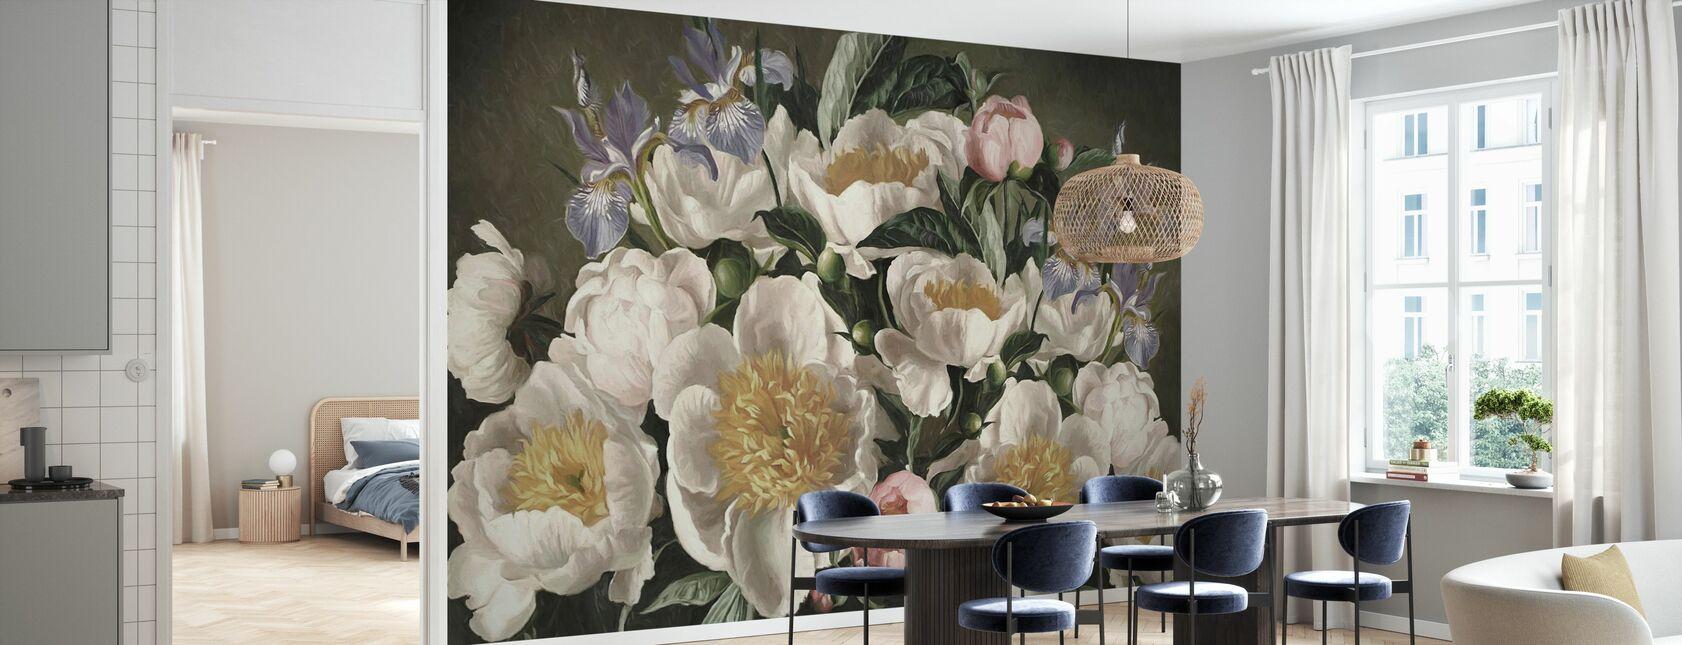 Iris and White Pions - Wallpaper - Kitchen